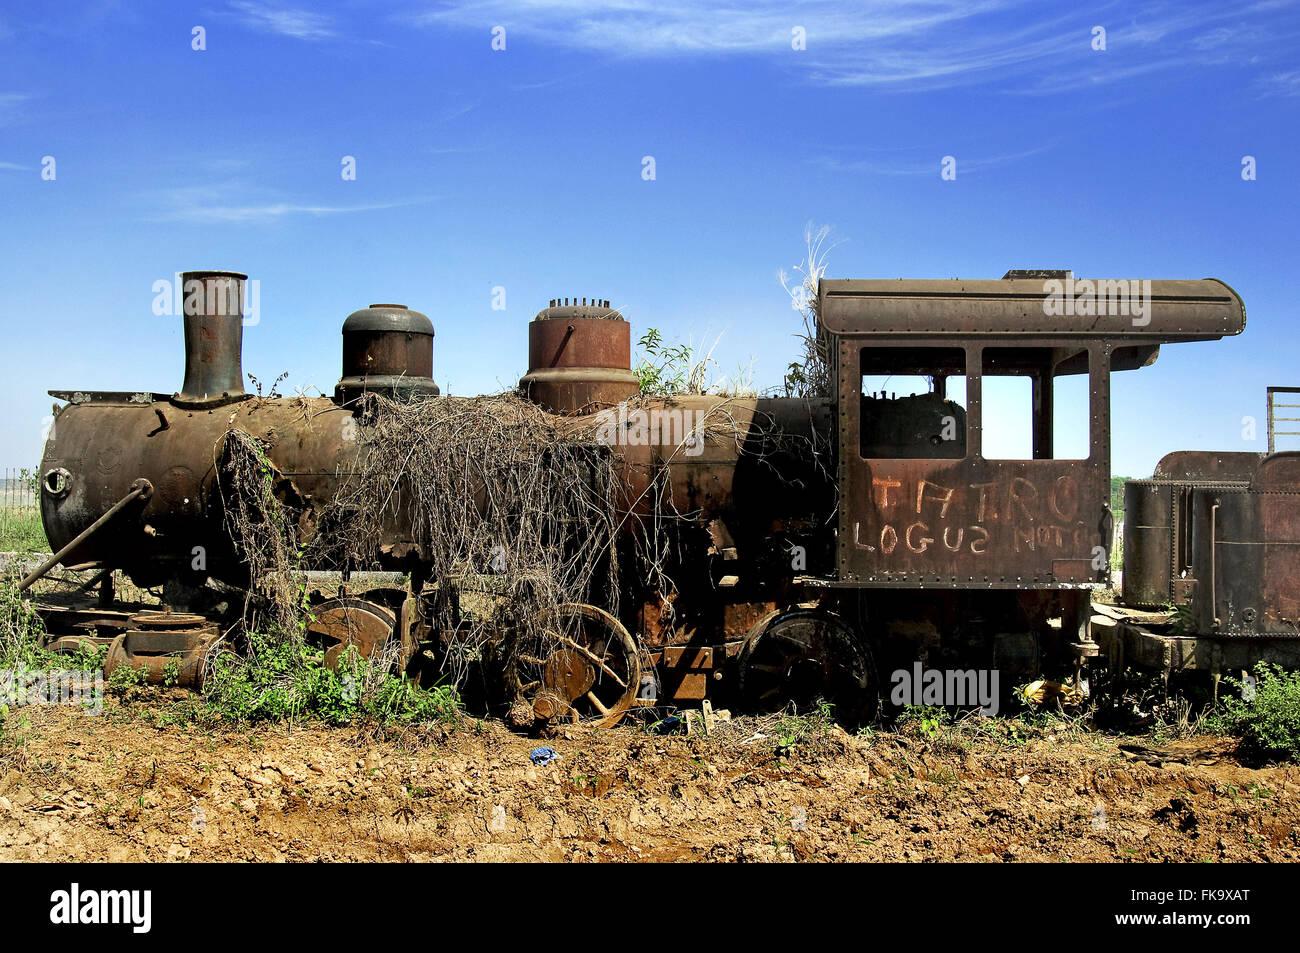 Locomotive in the ruins of the Madeira-Mamore in Porto Velho - Stock Image